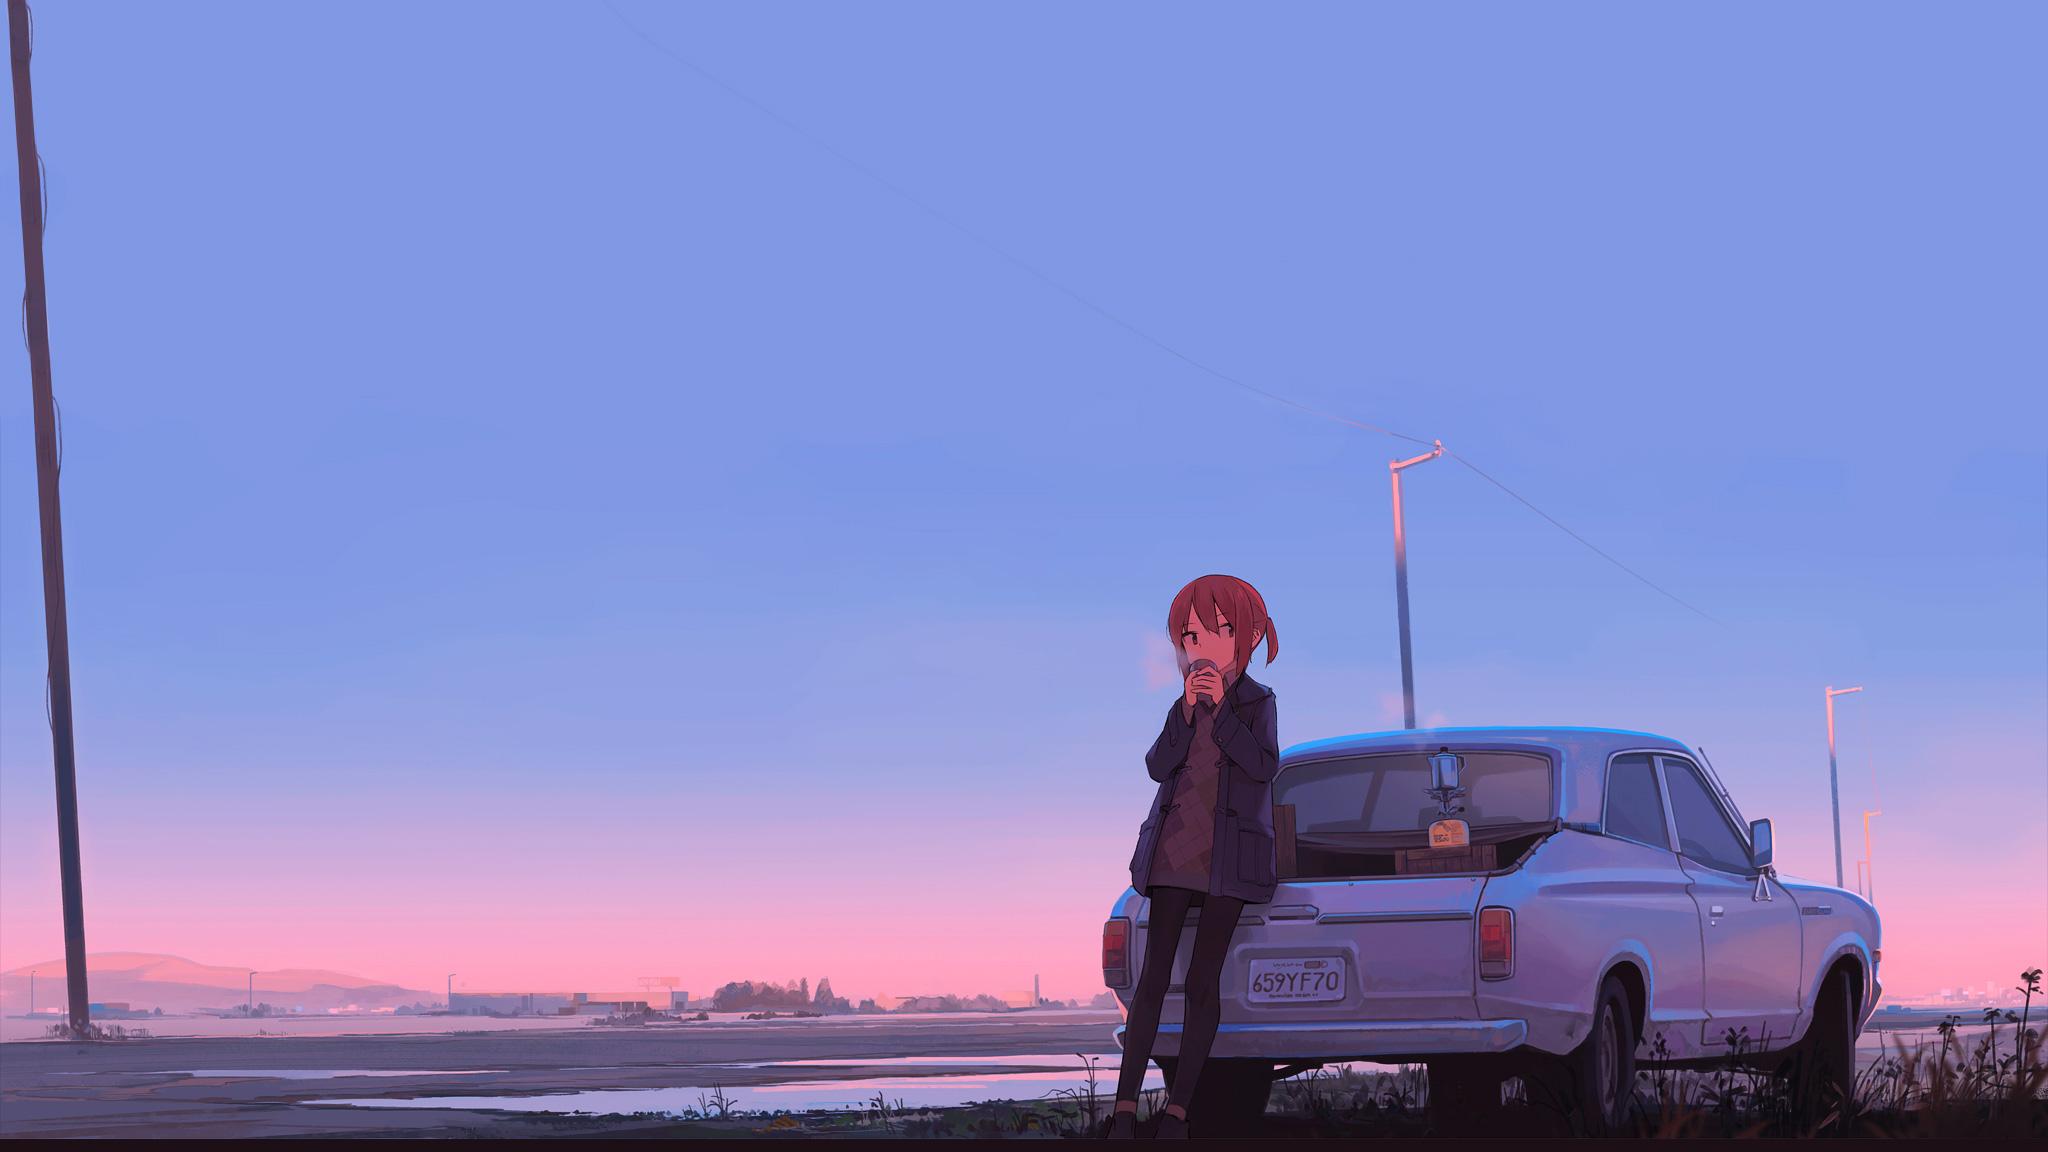 Indian Girl Wallpaper 2560x1440 Jpg Anime Girl Car Drinking Coffee Hd Anime 4k Wallpapers